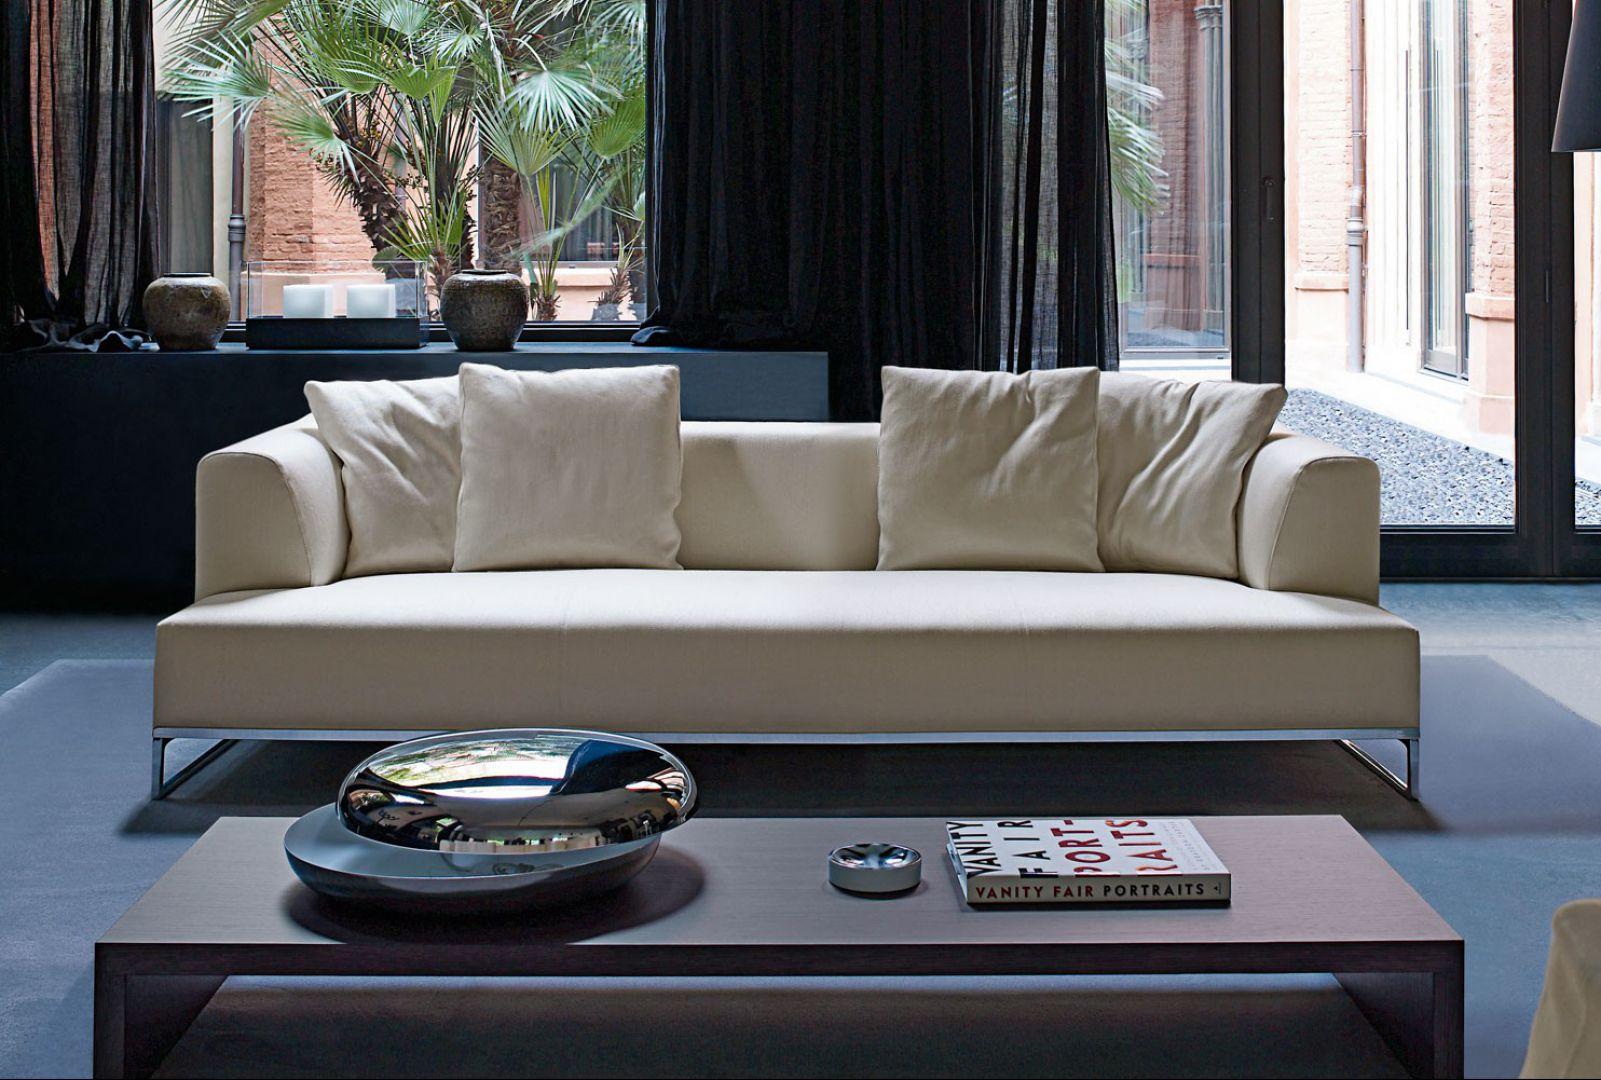 bia a sofa 20 propozycji do pokoju dziennego galeria. Black Bedroom Furniture Sets. Home Design Ideas